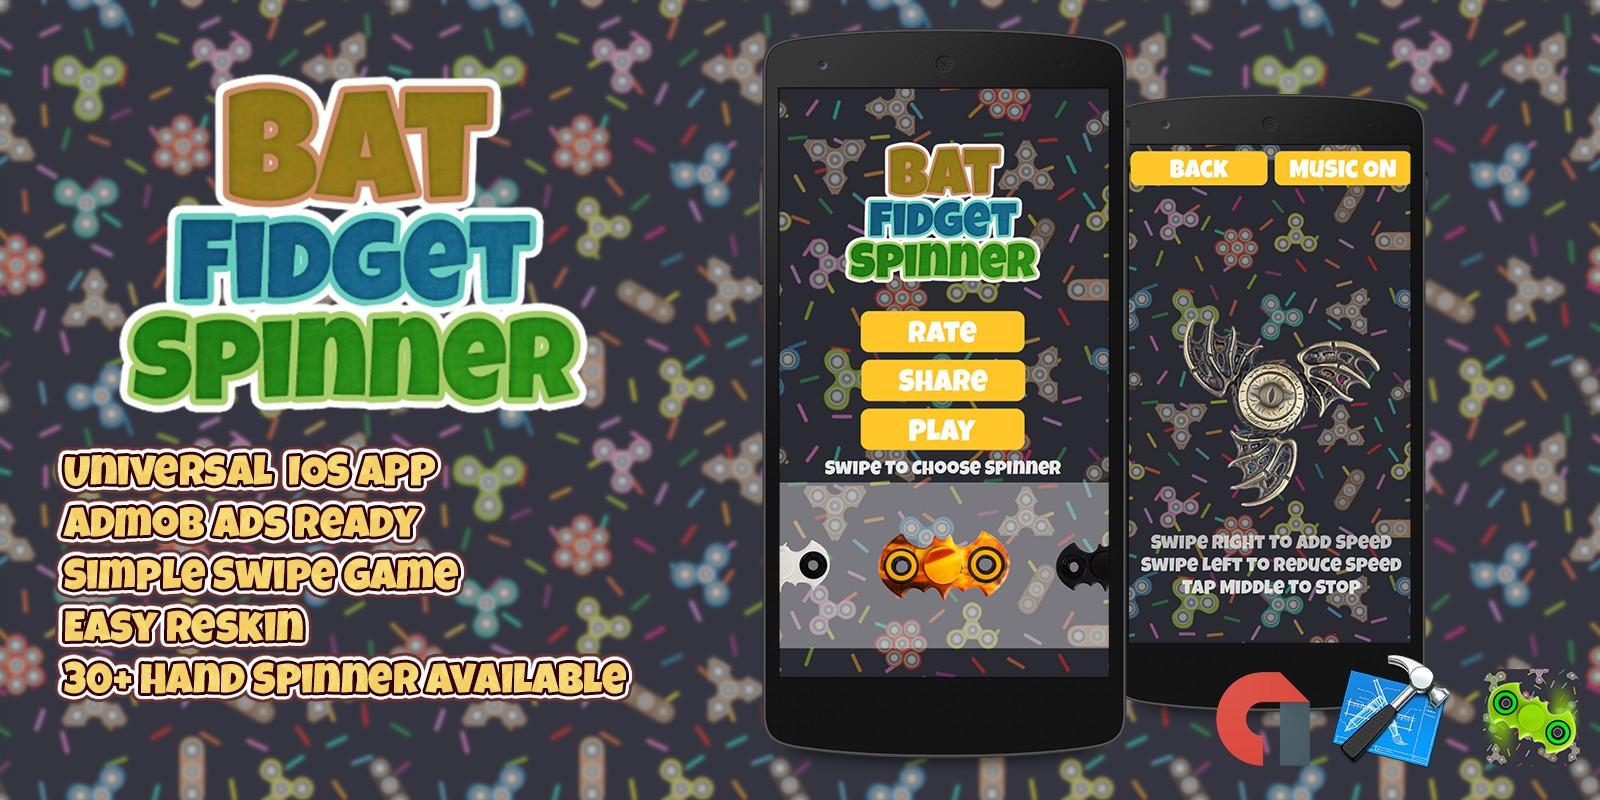 Bat Fidget Spinner - iOS Xcode Project